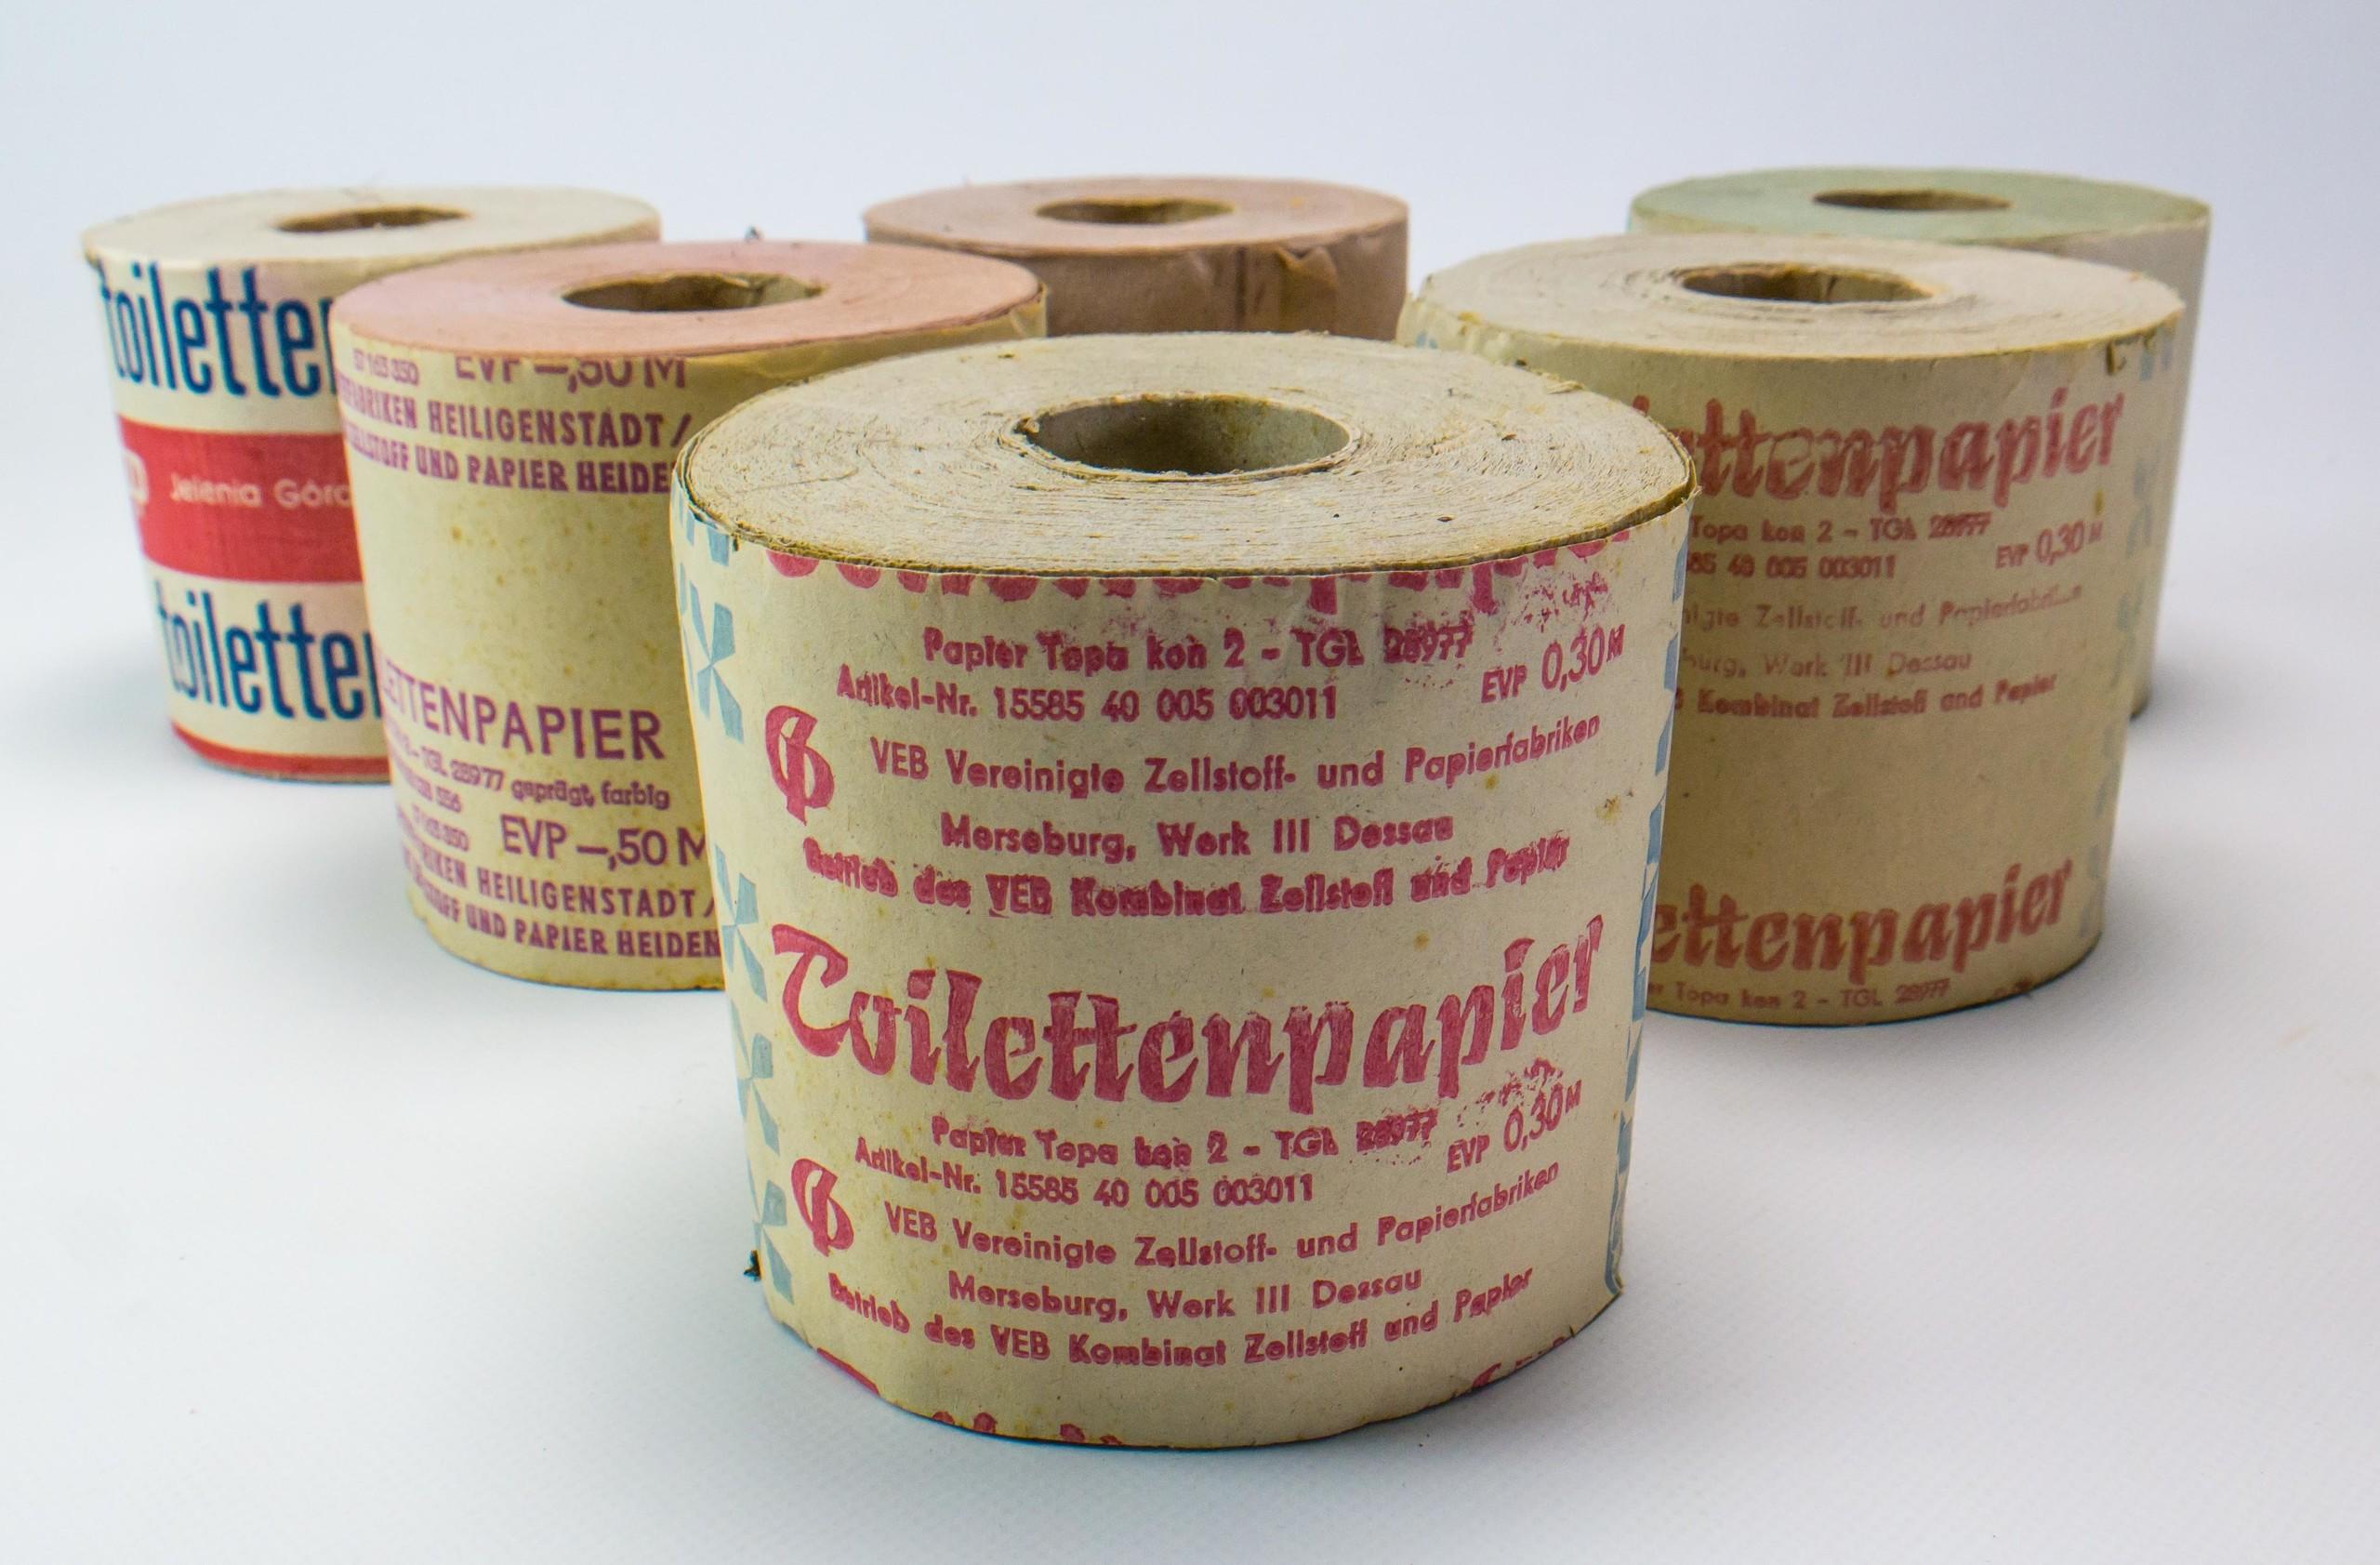 Toilettenpapier diverse | DDR Museum Berlin